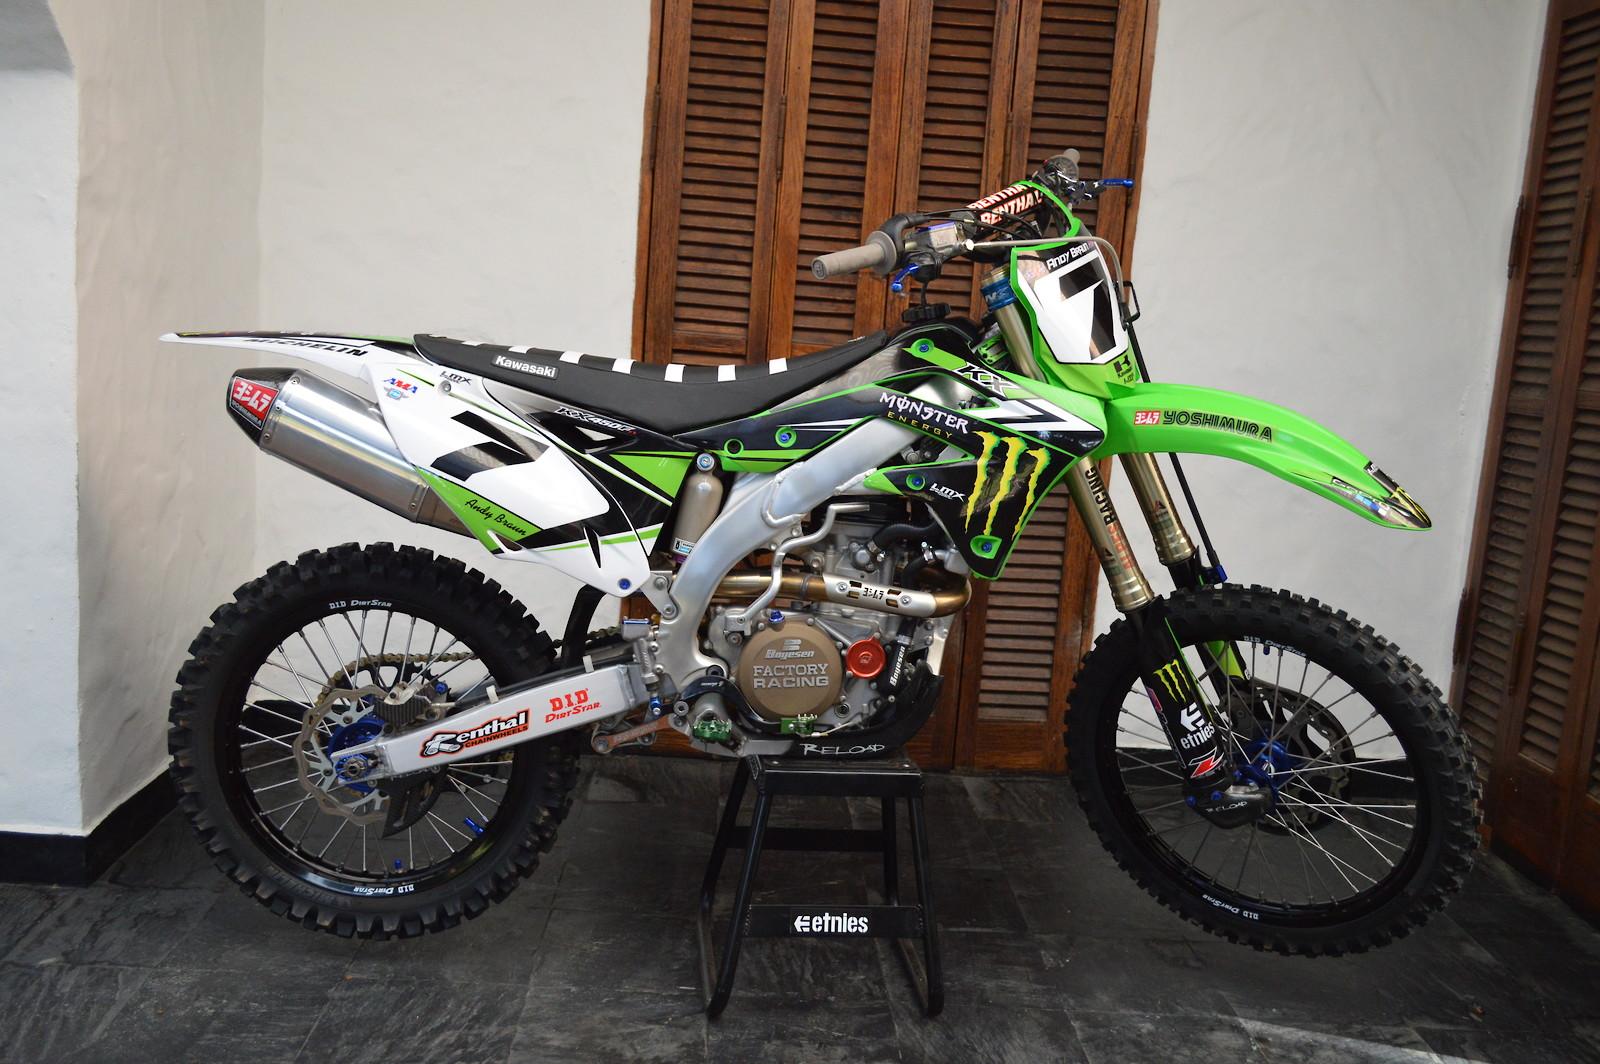 2012 KX450F